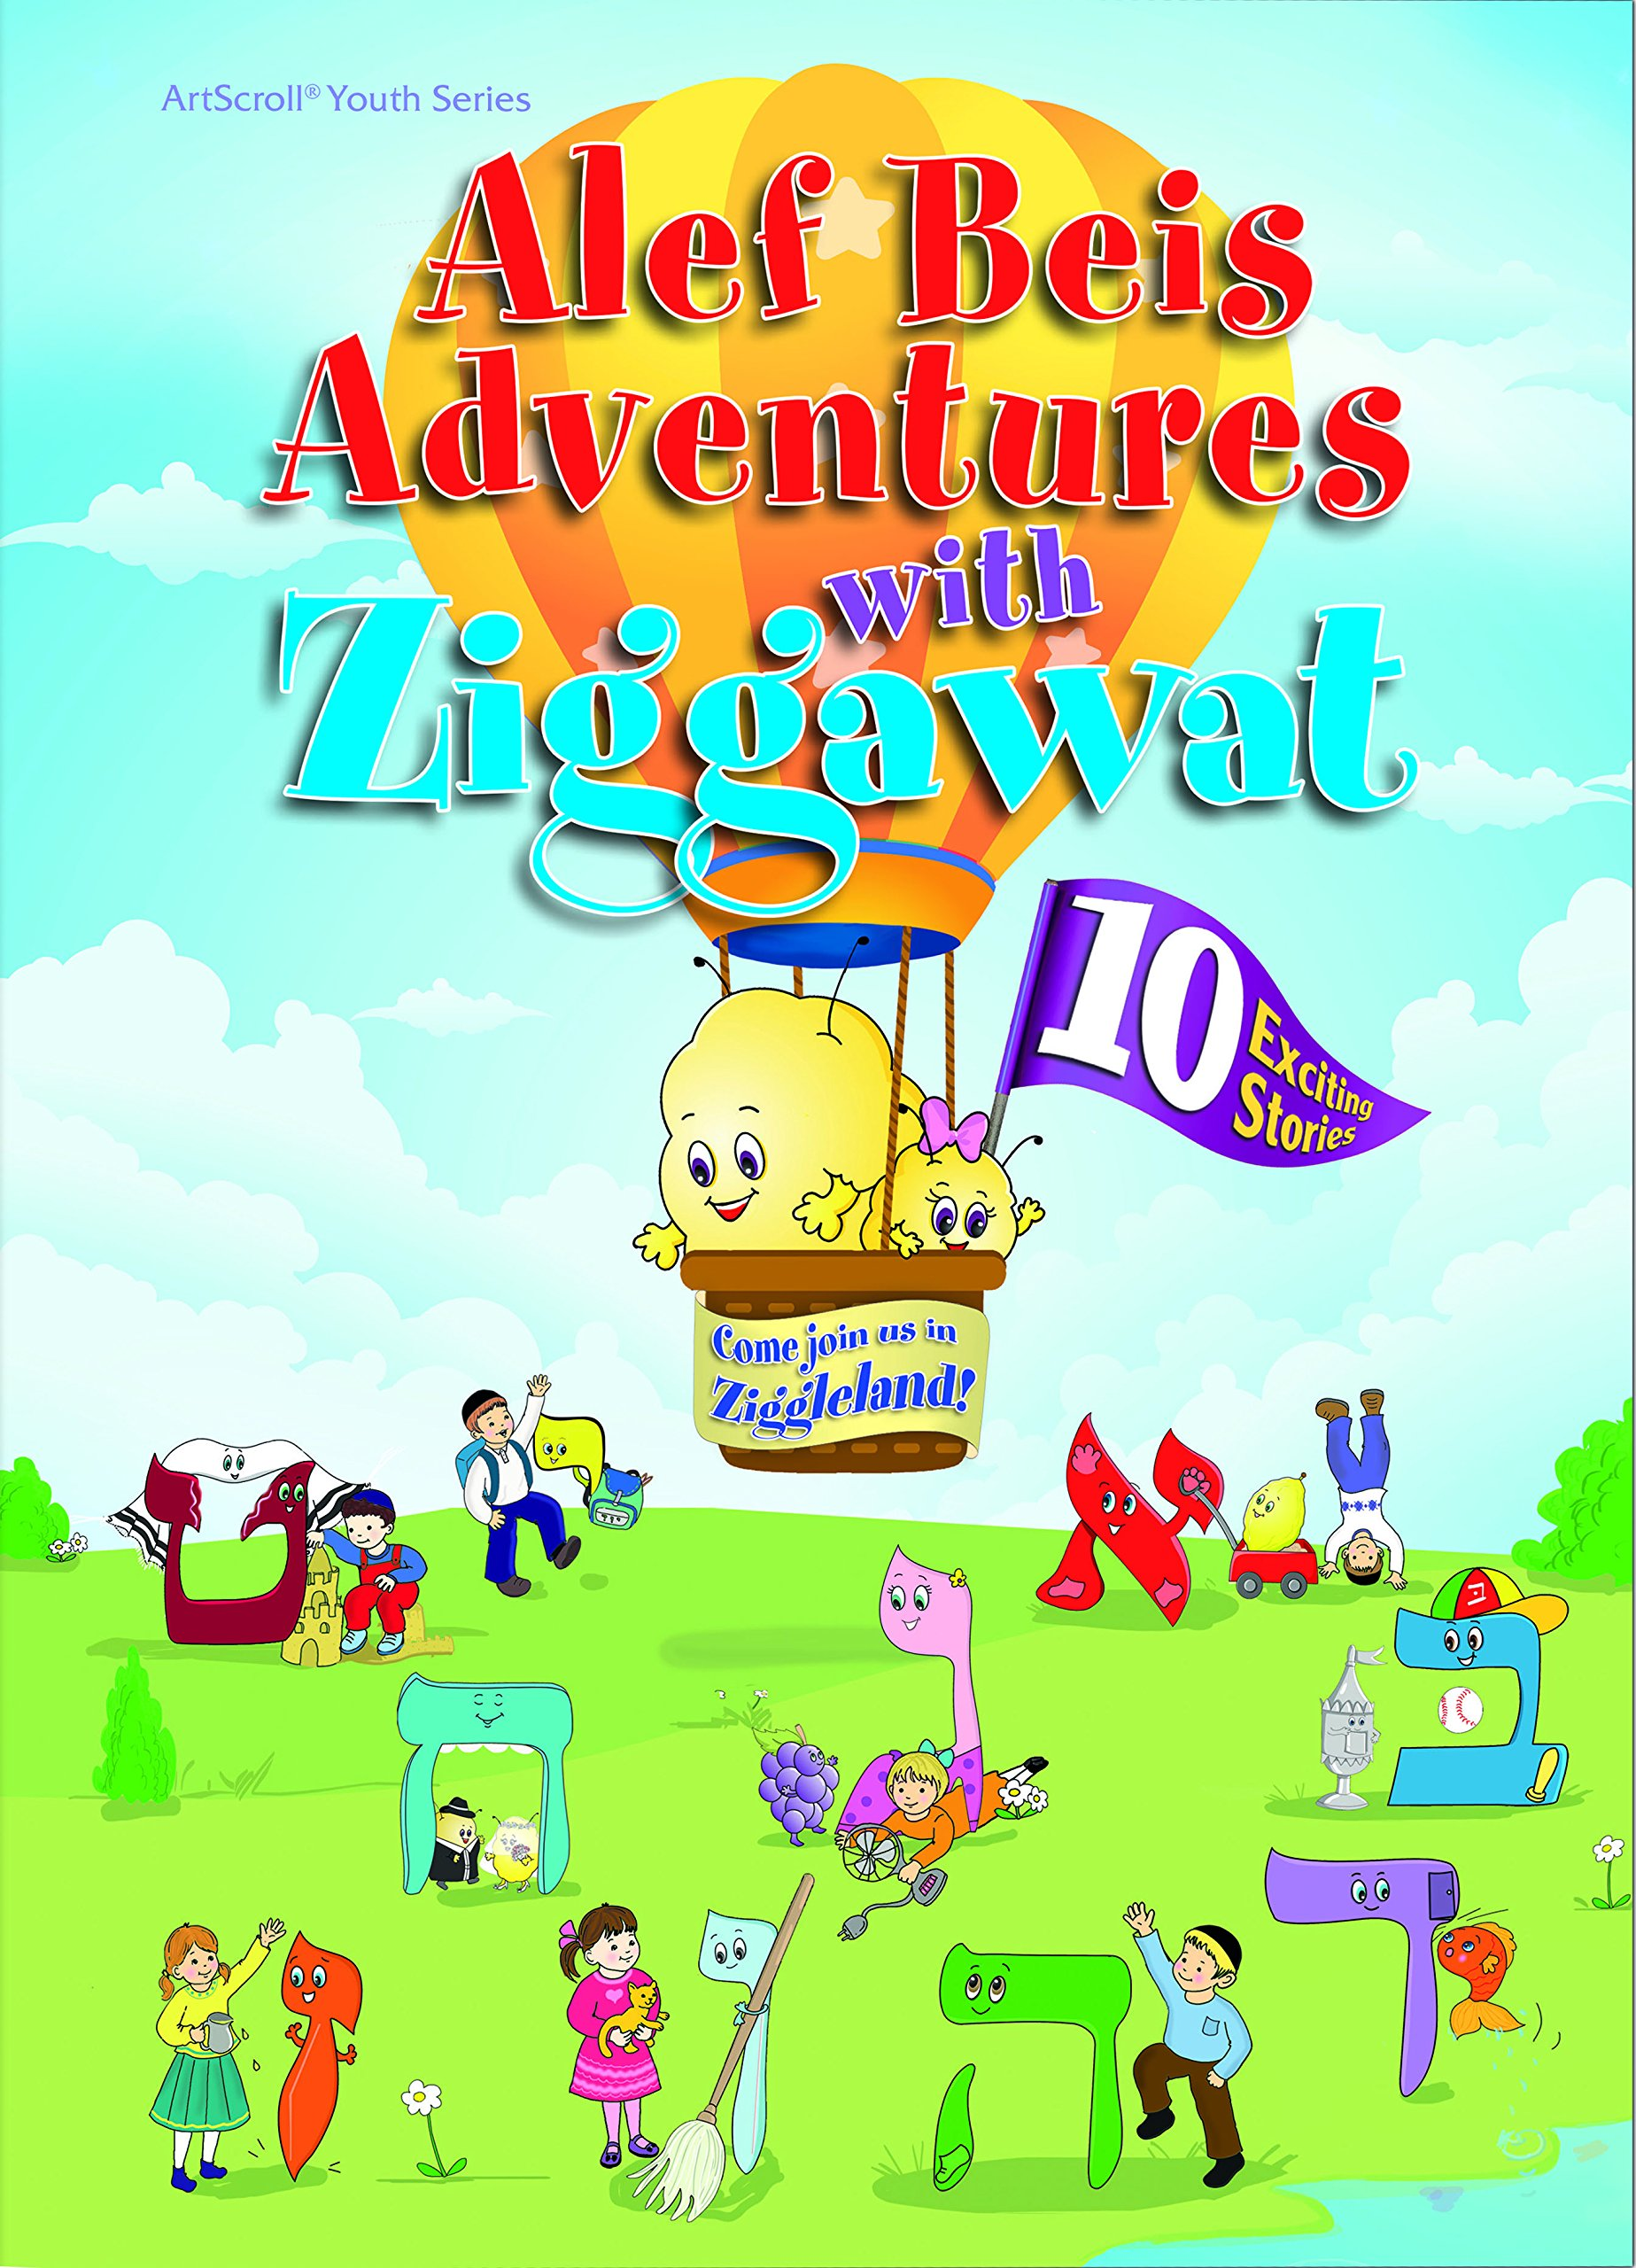 Download Alef Beis Adventures With Ziggawat pdf epub